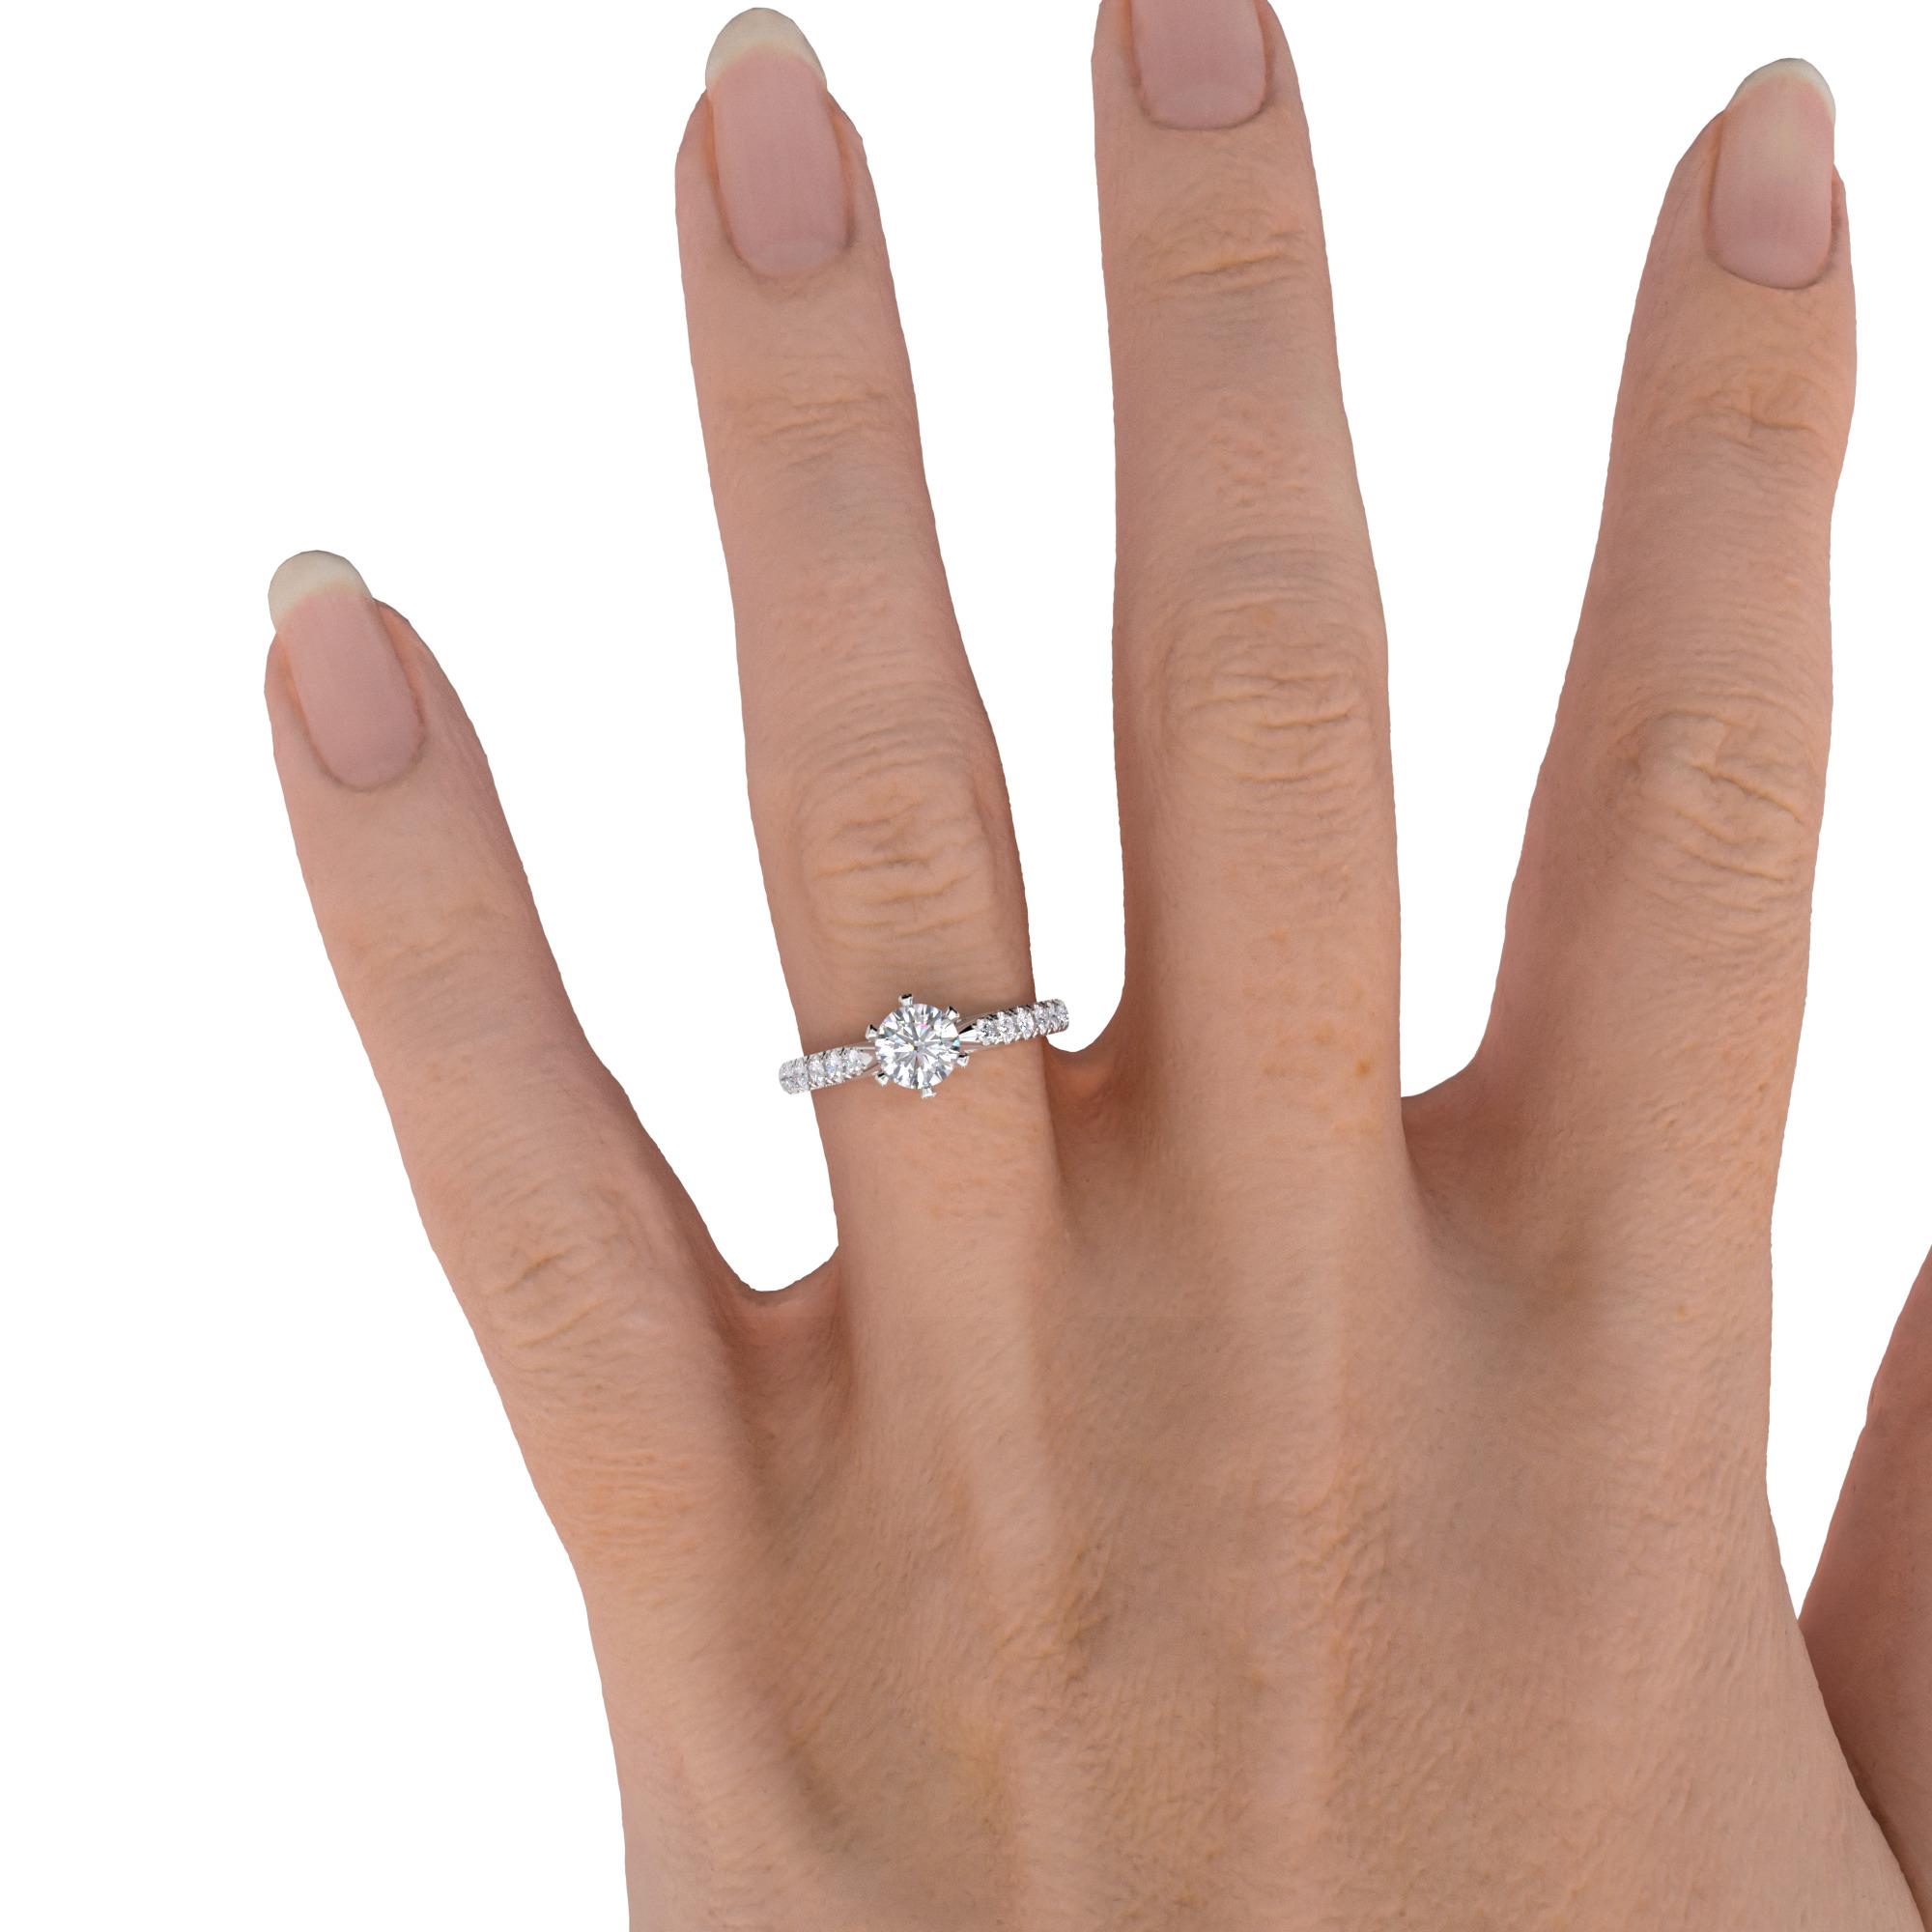 Inel de Logodna Solitaire cu Diamante Mici pe Lateral Dama Aur Alb 18kt cu Diamantul Central in 6 Gheare si Diamante Rotunde pe Lateral-img1